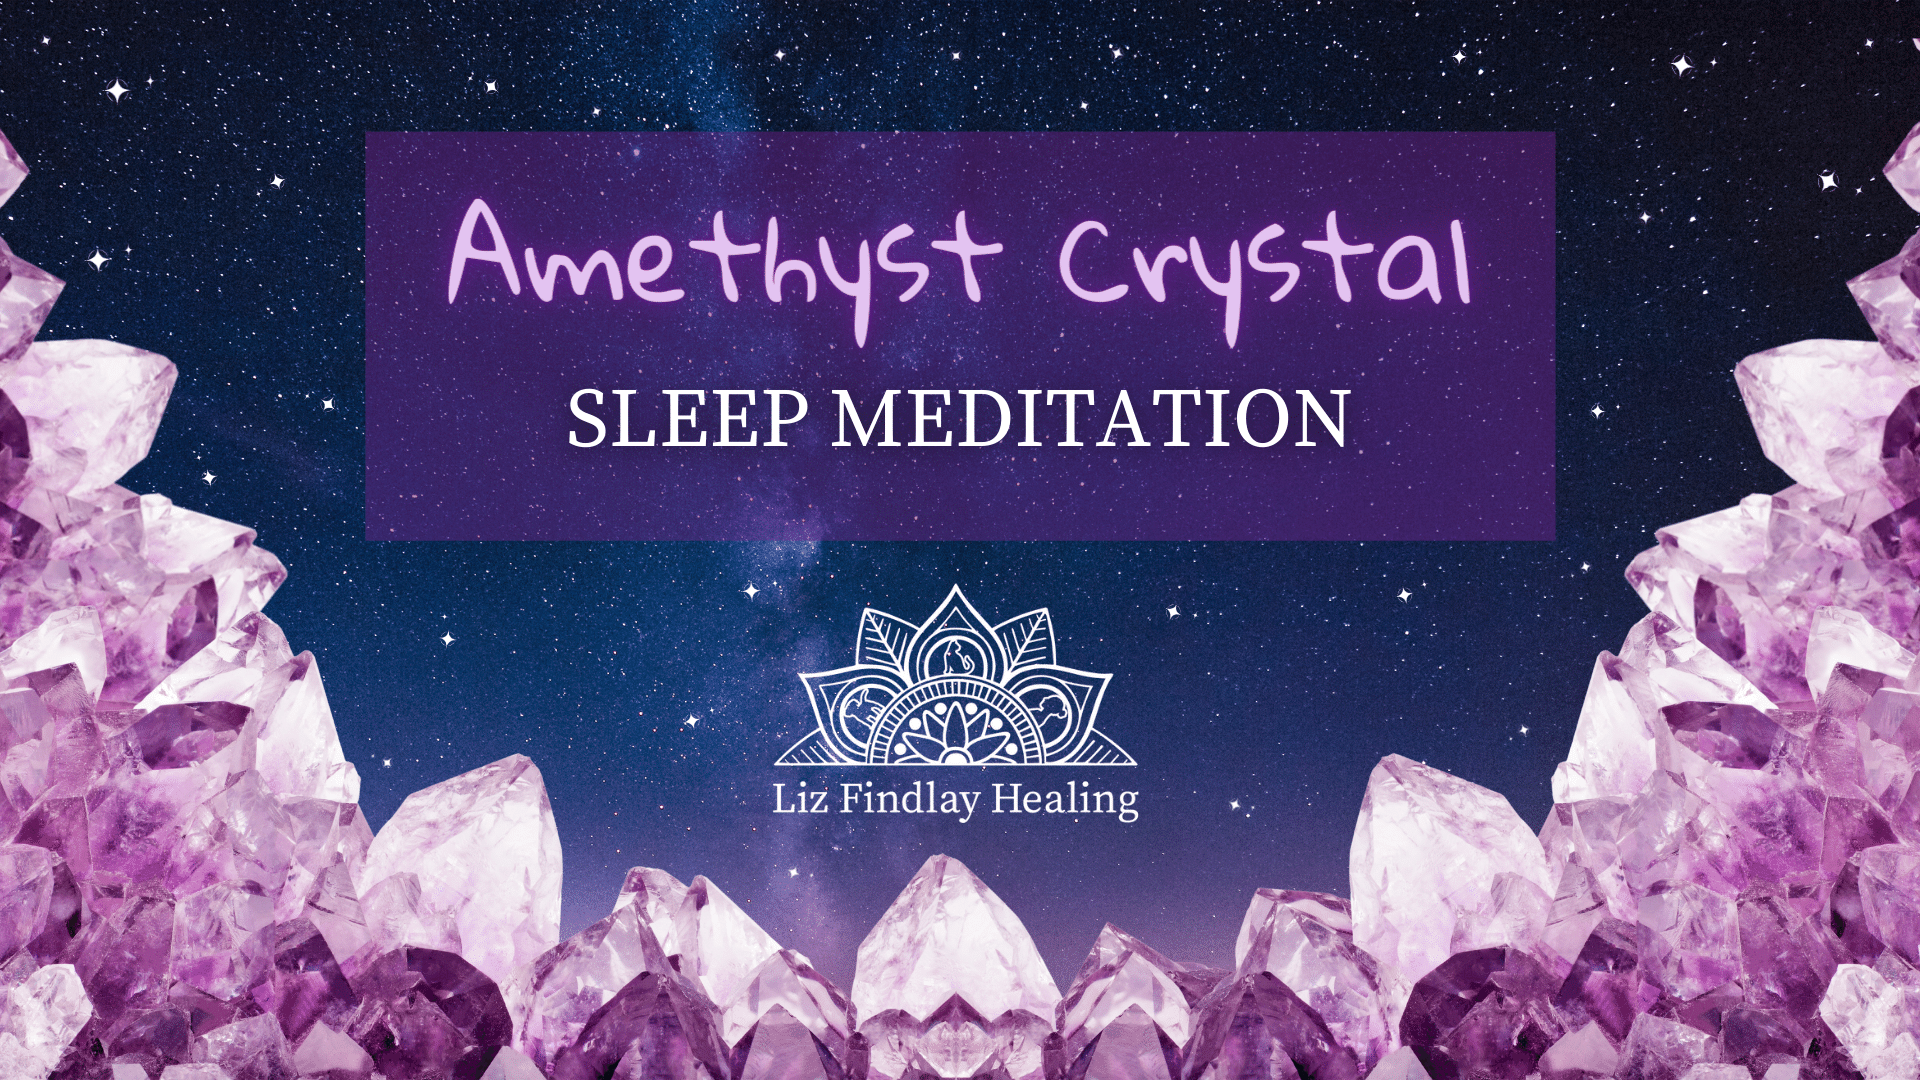 Amethyst Crystal Sleep Meditation - With Liz Findlay